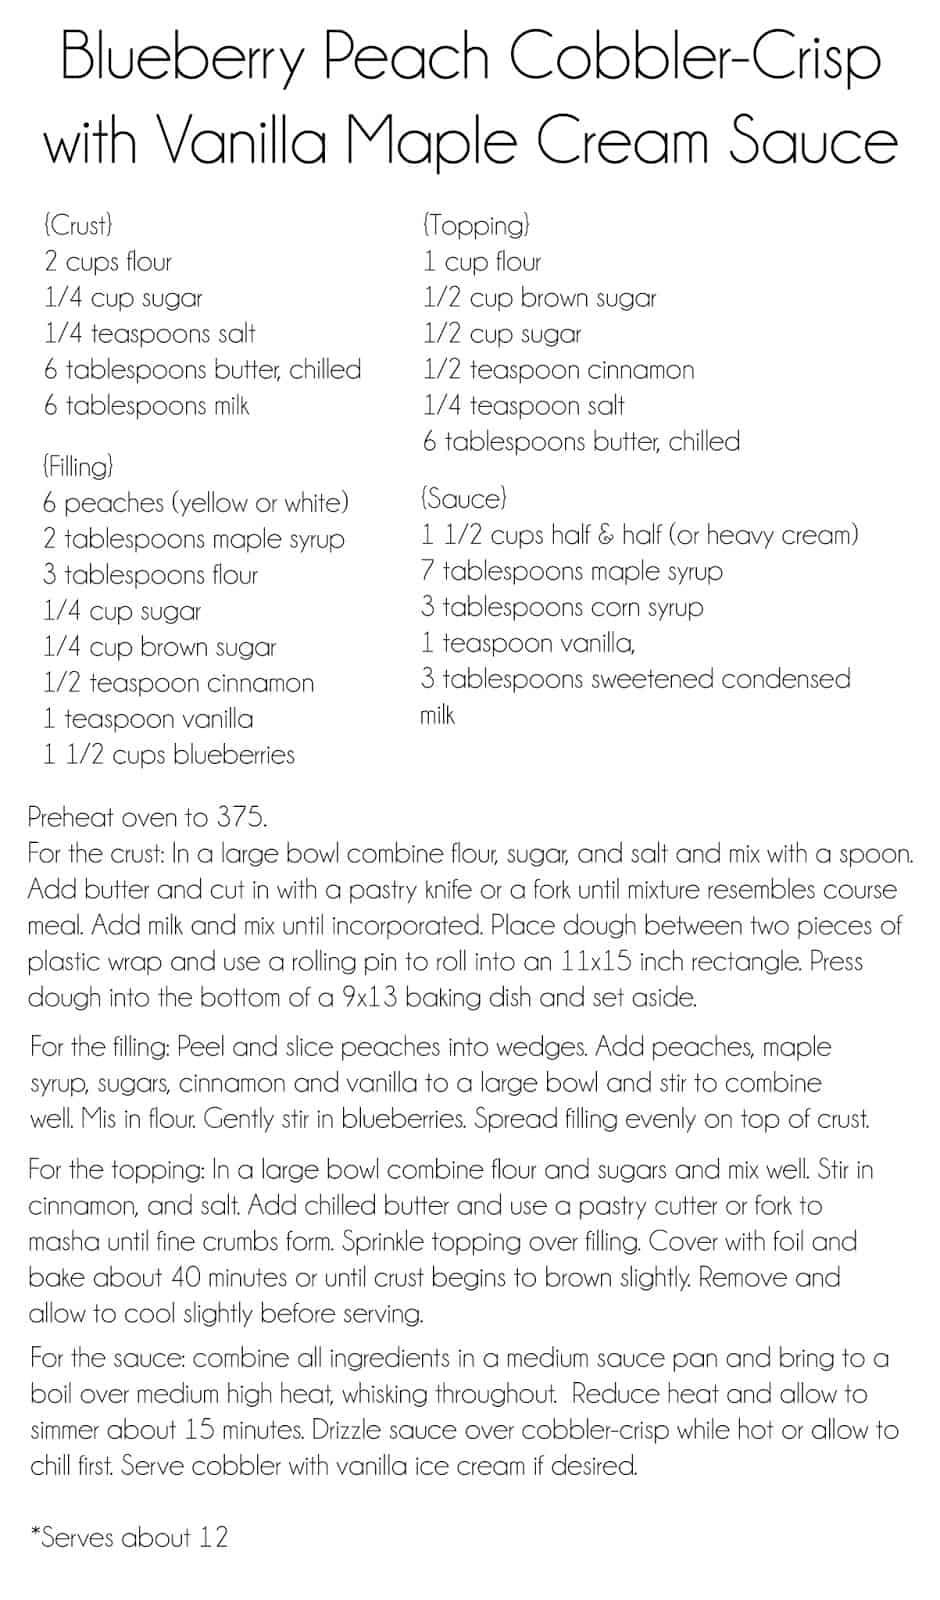 Blueberry Peach Cobbler Crisp with Vanilla Maple Cream Sauce - Creme ...